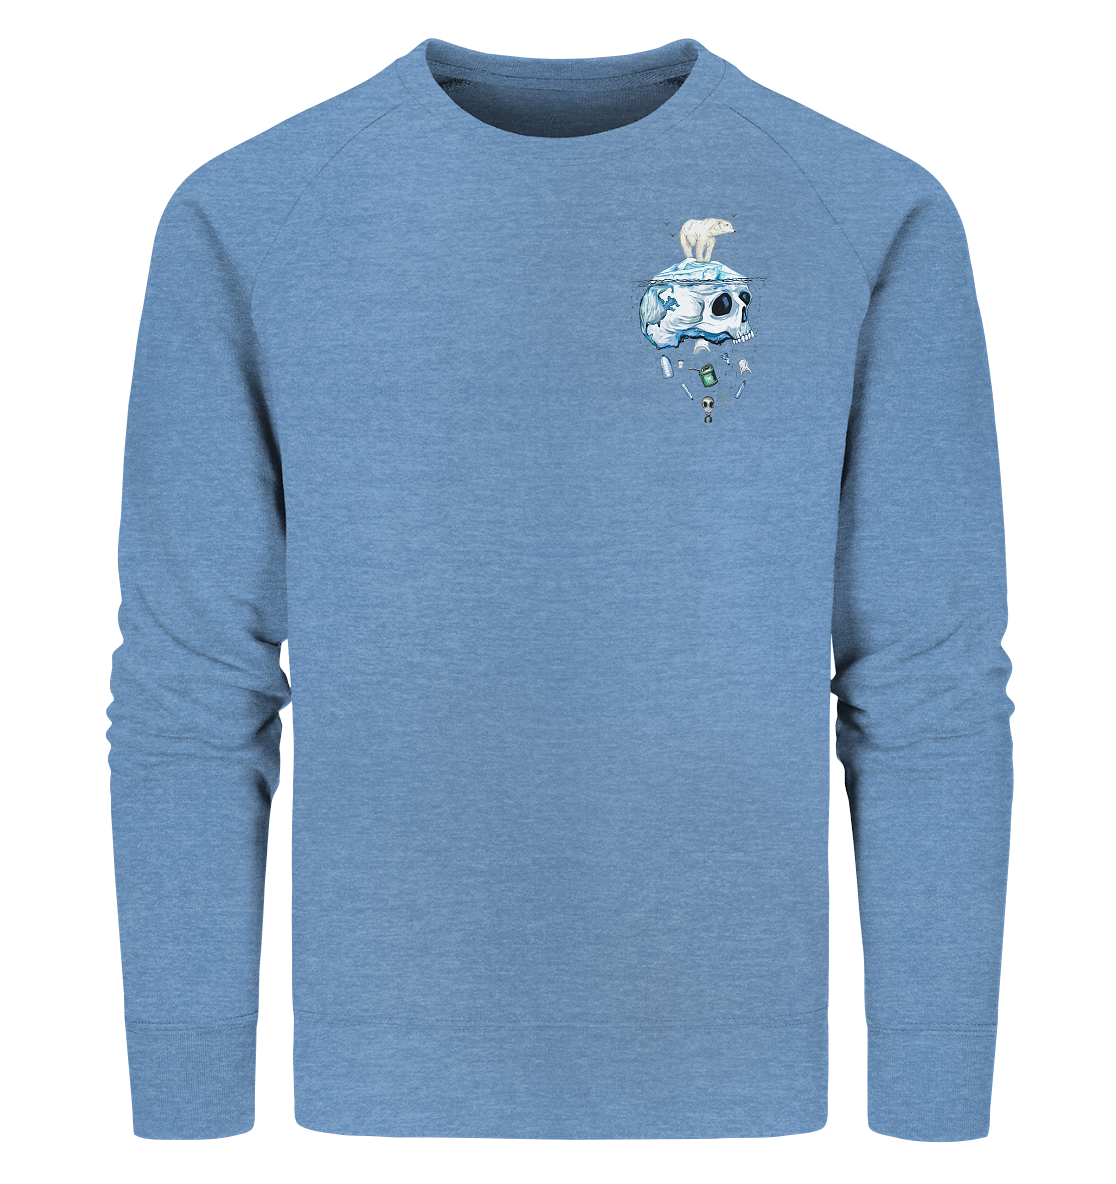 front-organic-sweatshirt-6090c4-1116x-1.png